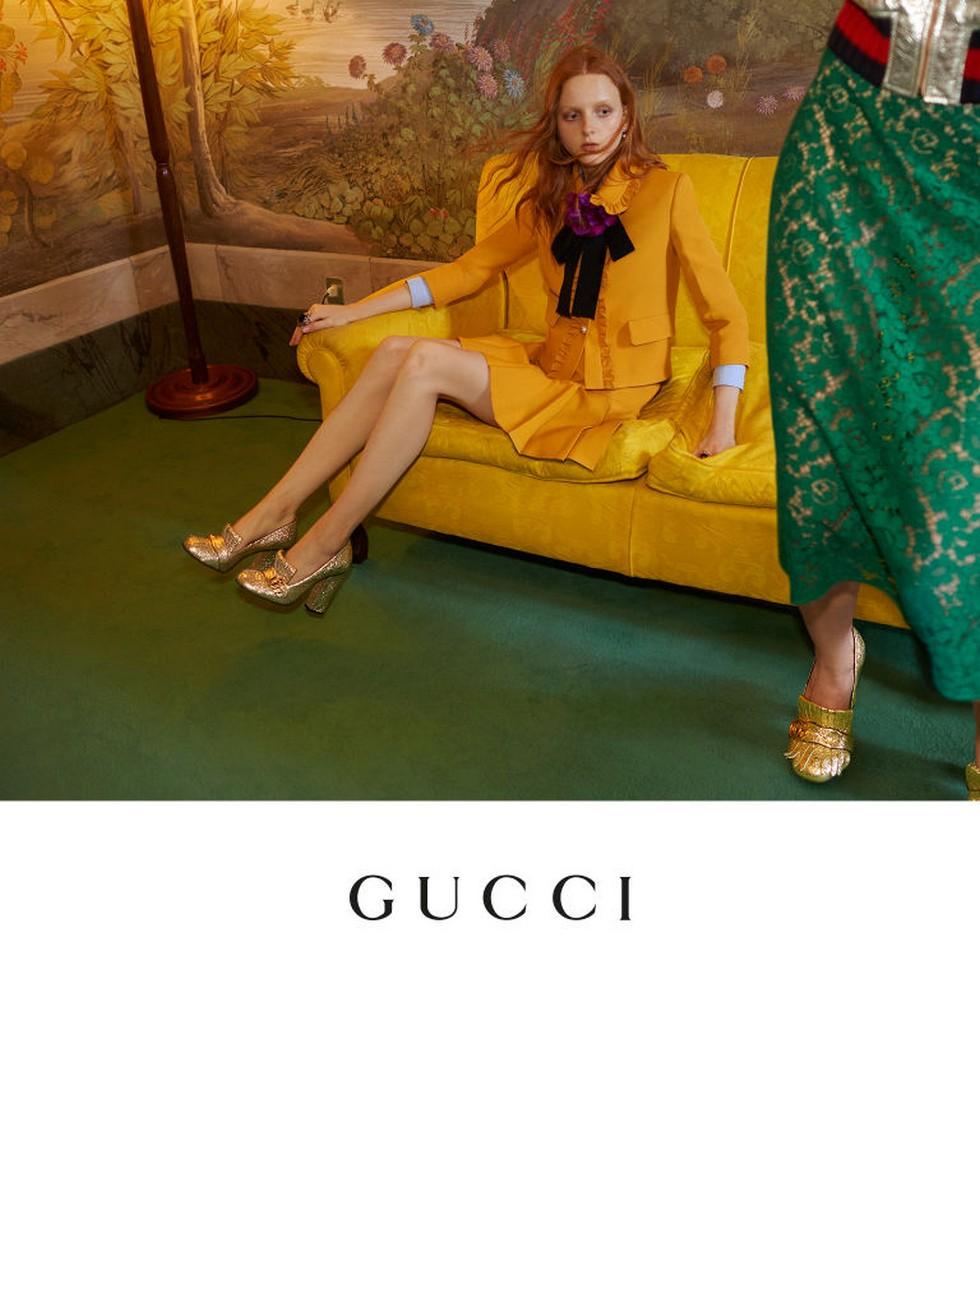 Milan Fashion Boutiques Gucci unveils new store concept (7) Milan Fashion Boutiques: Gucci unveils new store concept Milan Fashion Boutiques: Gucci unveils new store concept Milan Fashion Boutiques Gucci unveils new store concept 7